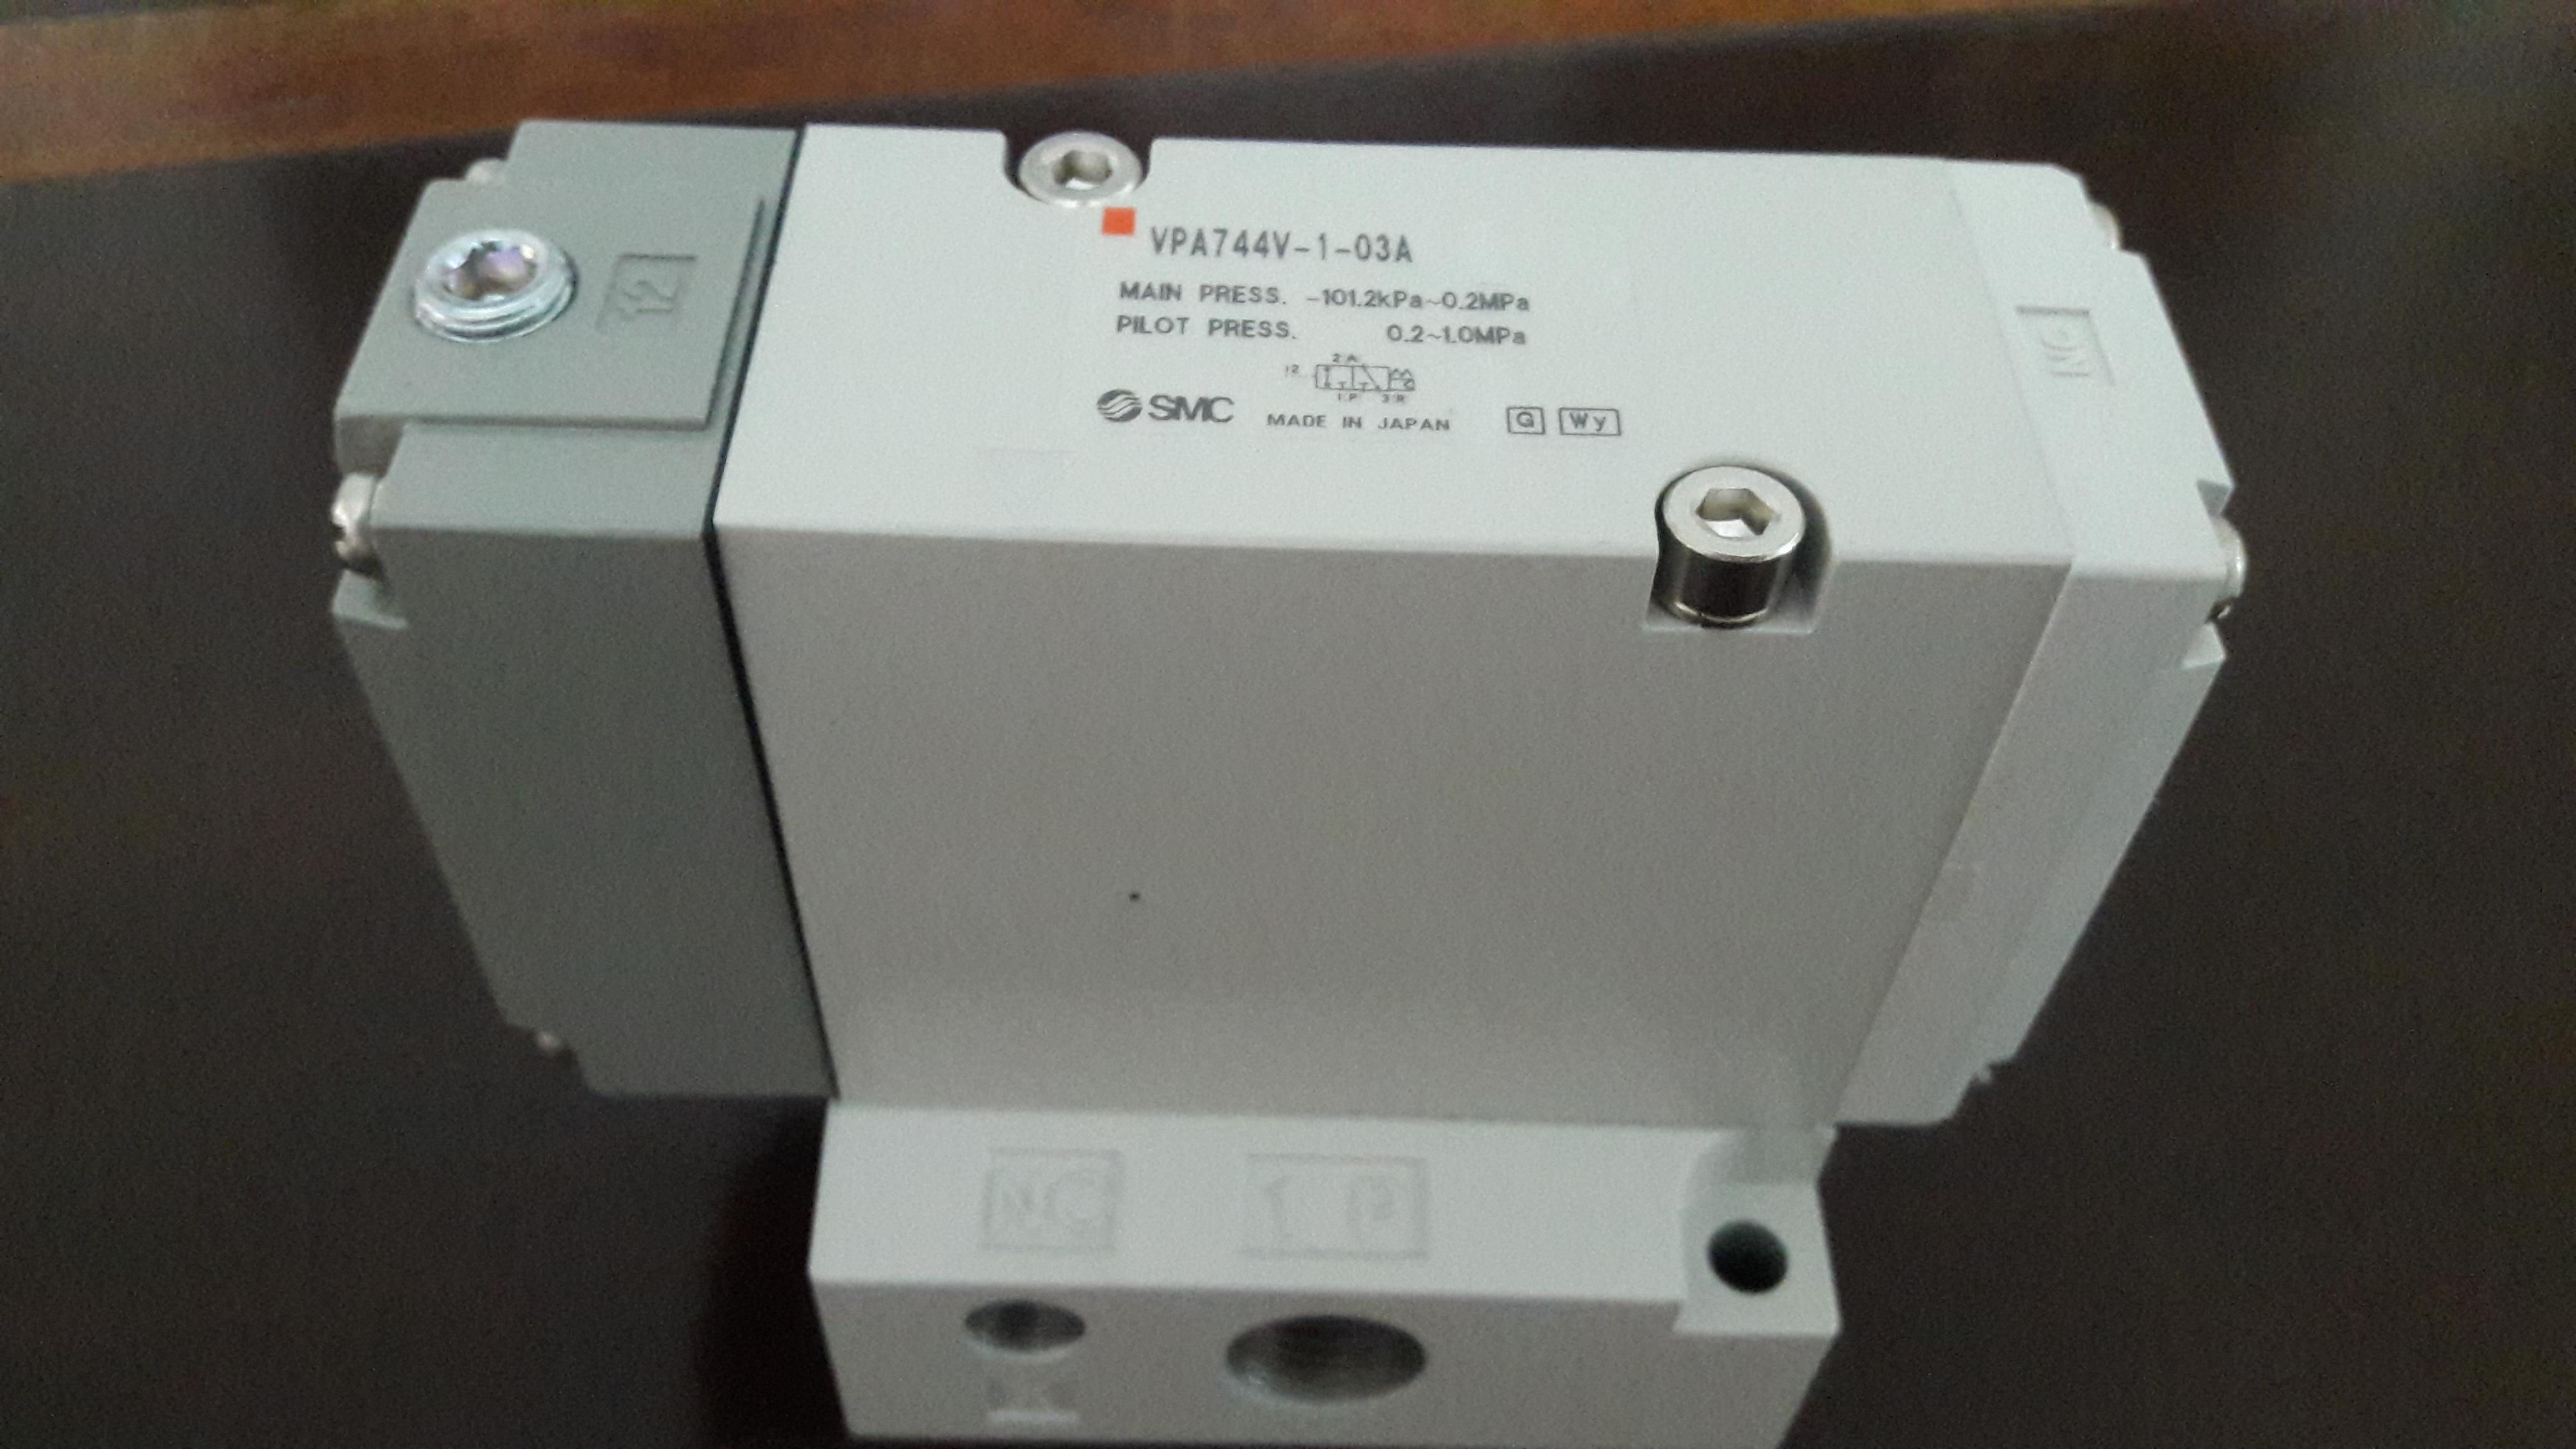 SMC VPA744V-1-03A